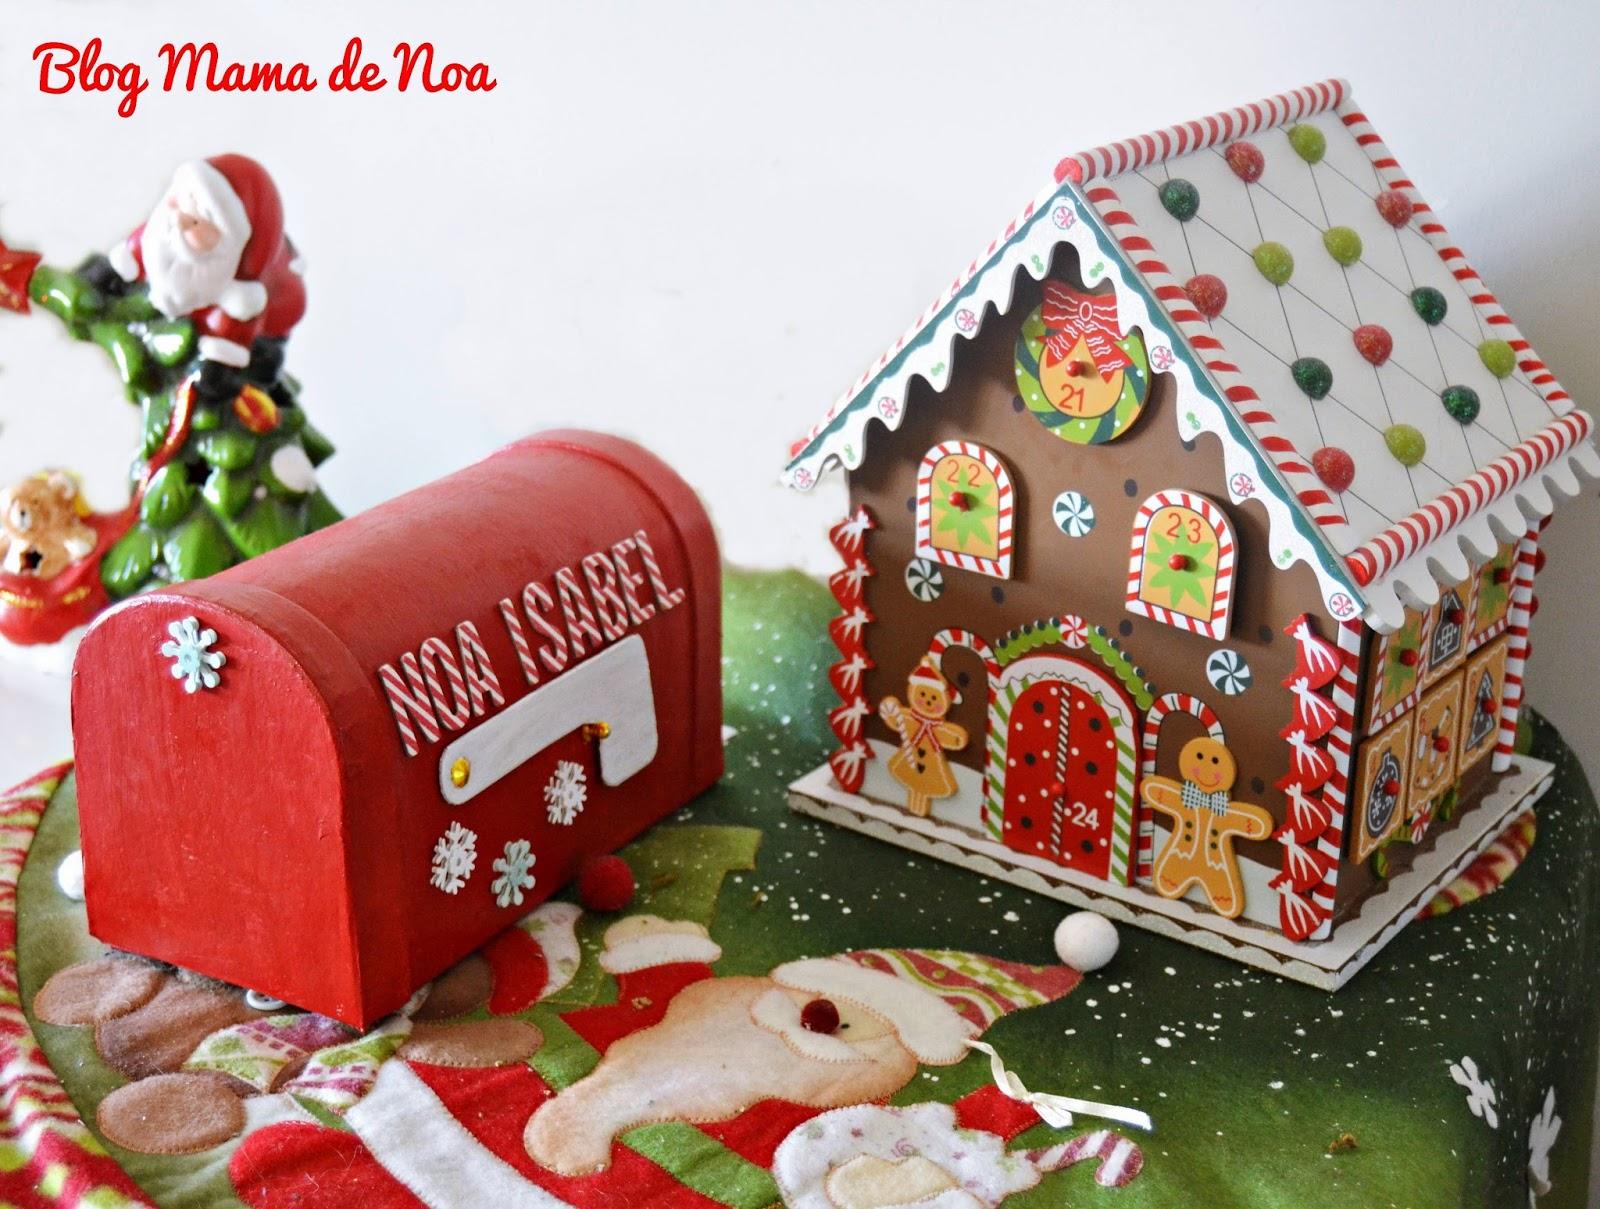 DIY Buzón para Papa Noel blog infantil mama de Noa